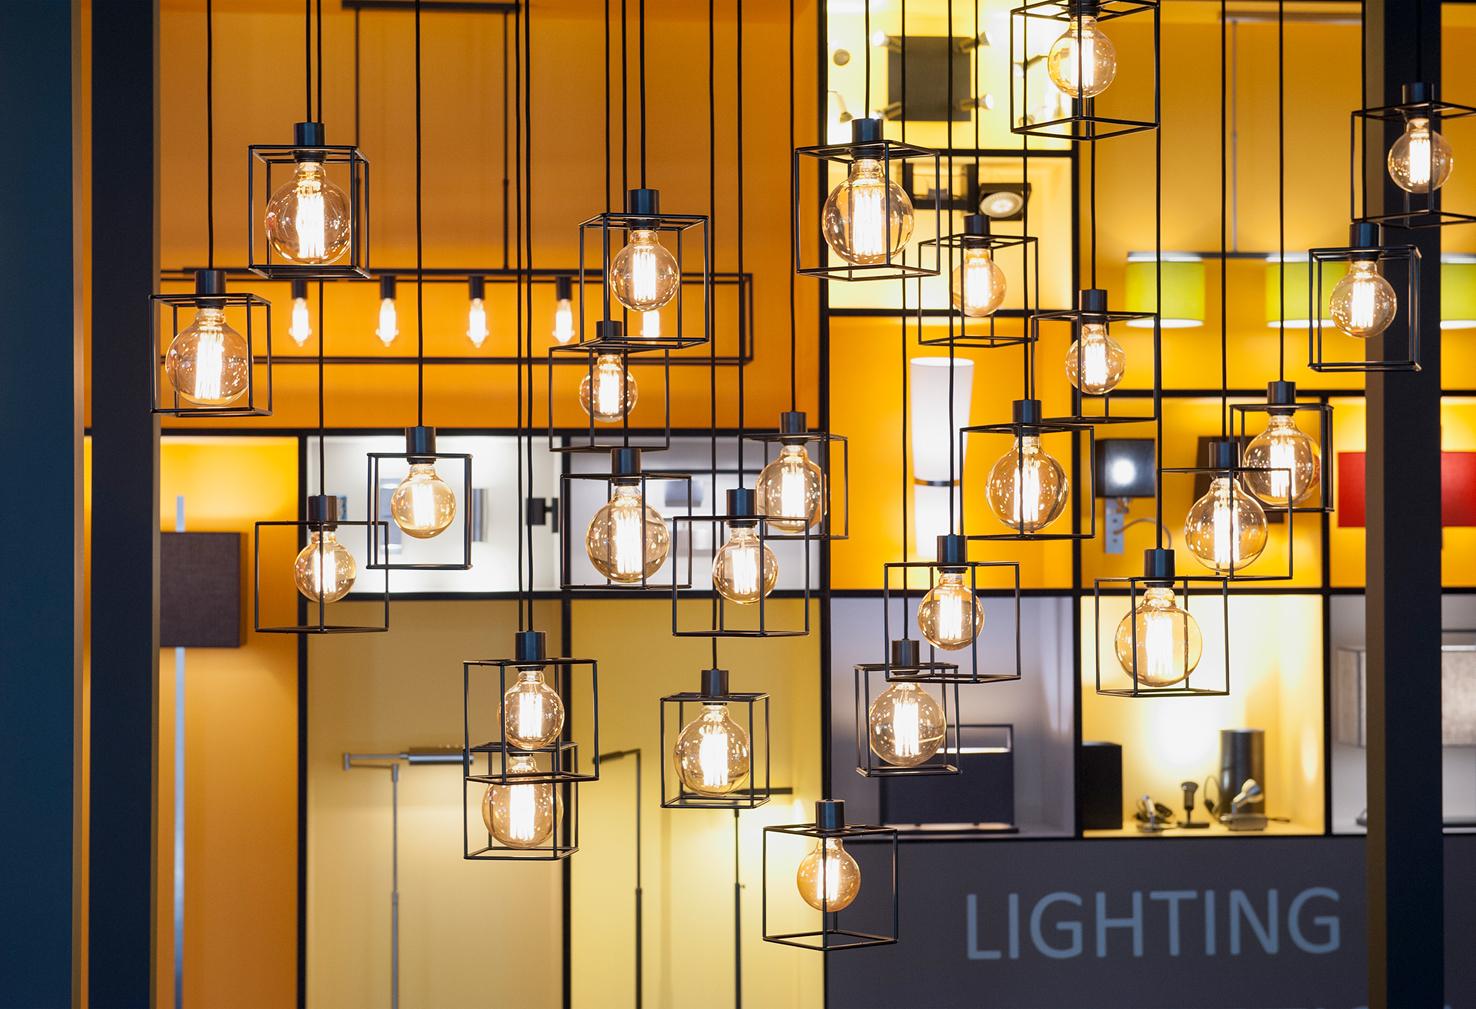 Quot Evoke Emotions Quot The Trend Forum At Light Building